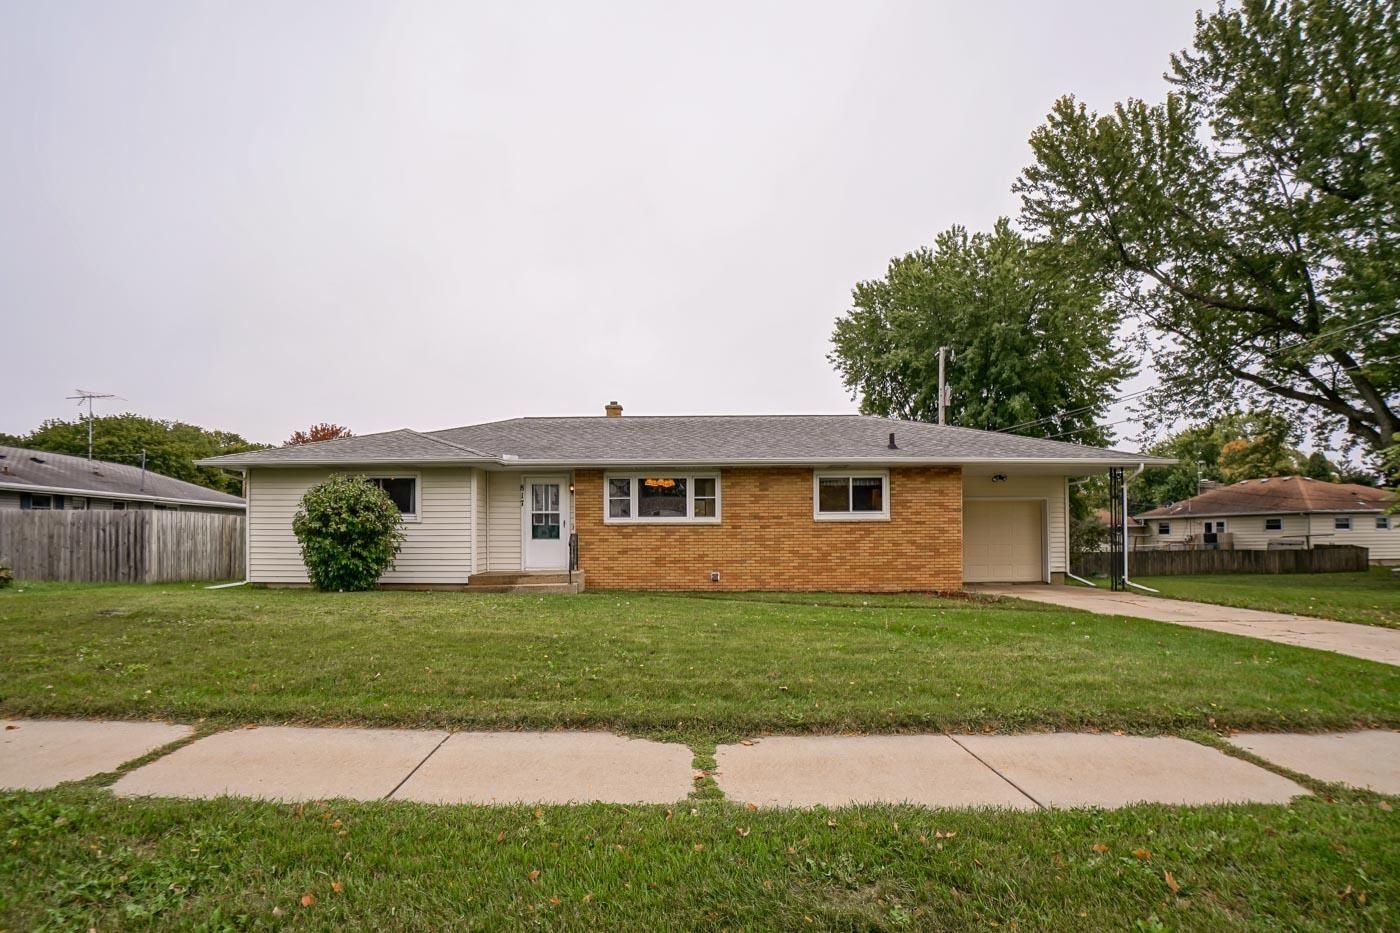 817 N Bristol St, Sun Prairie, WI 53590-1440 - #: 1921240